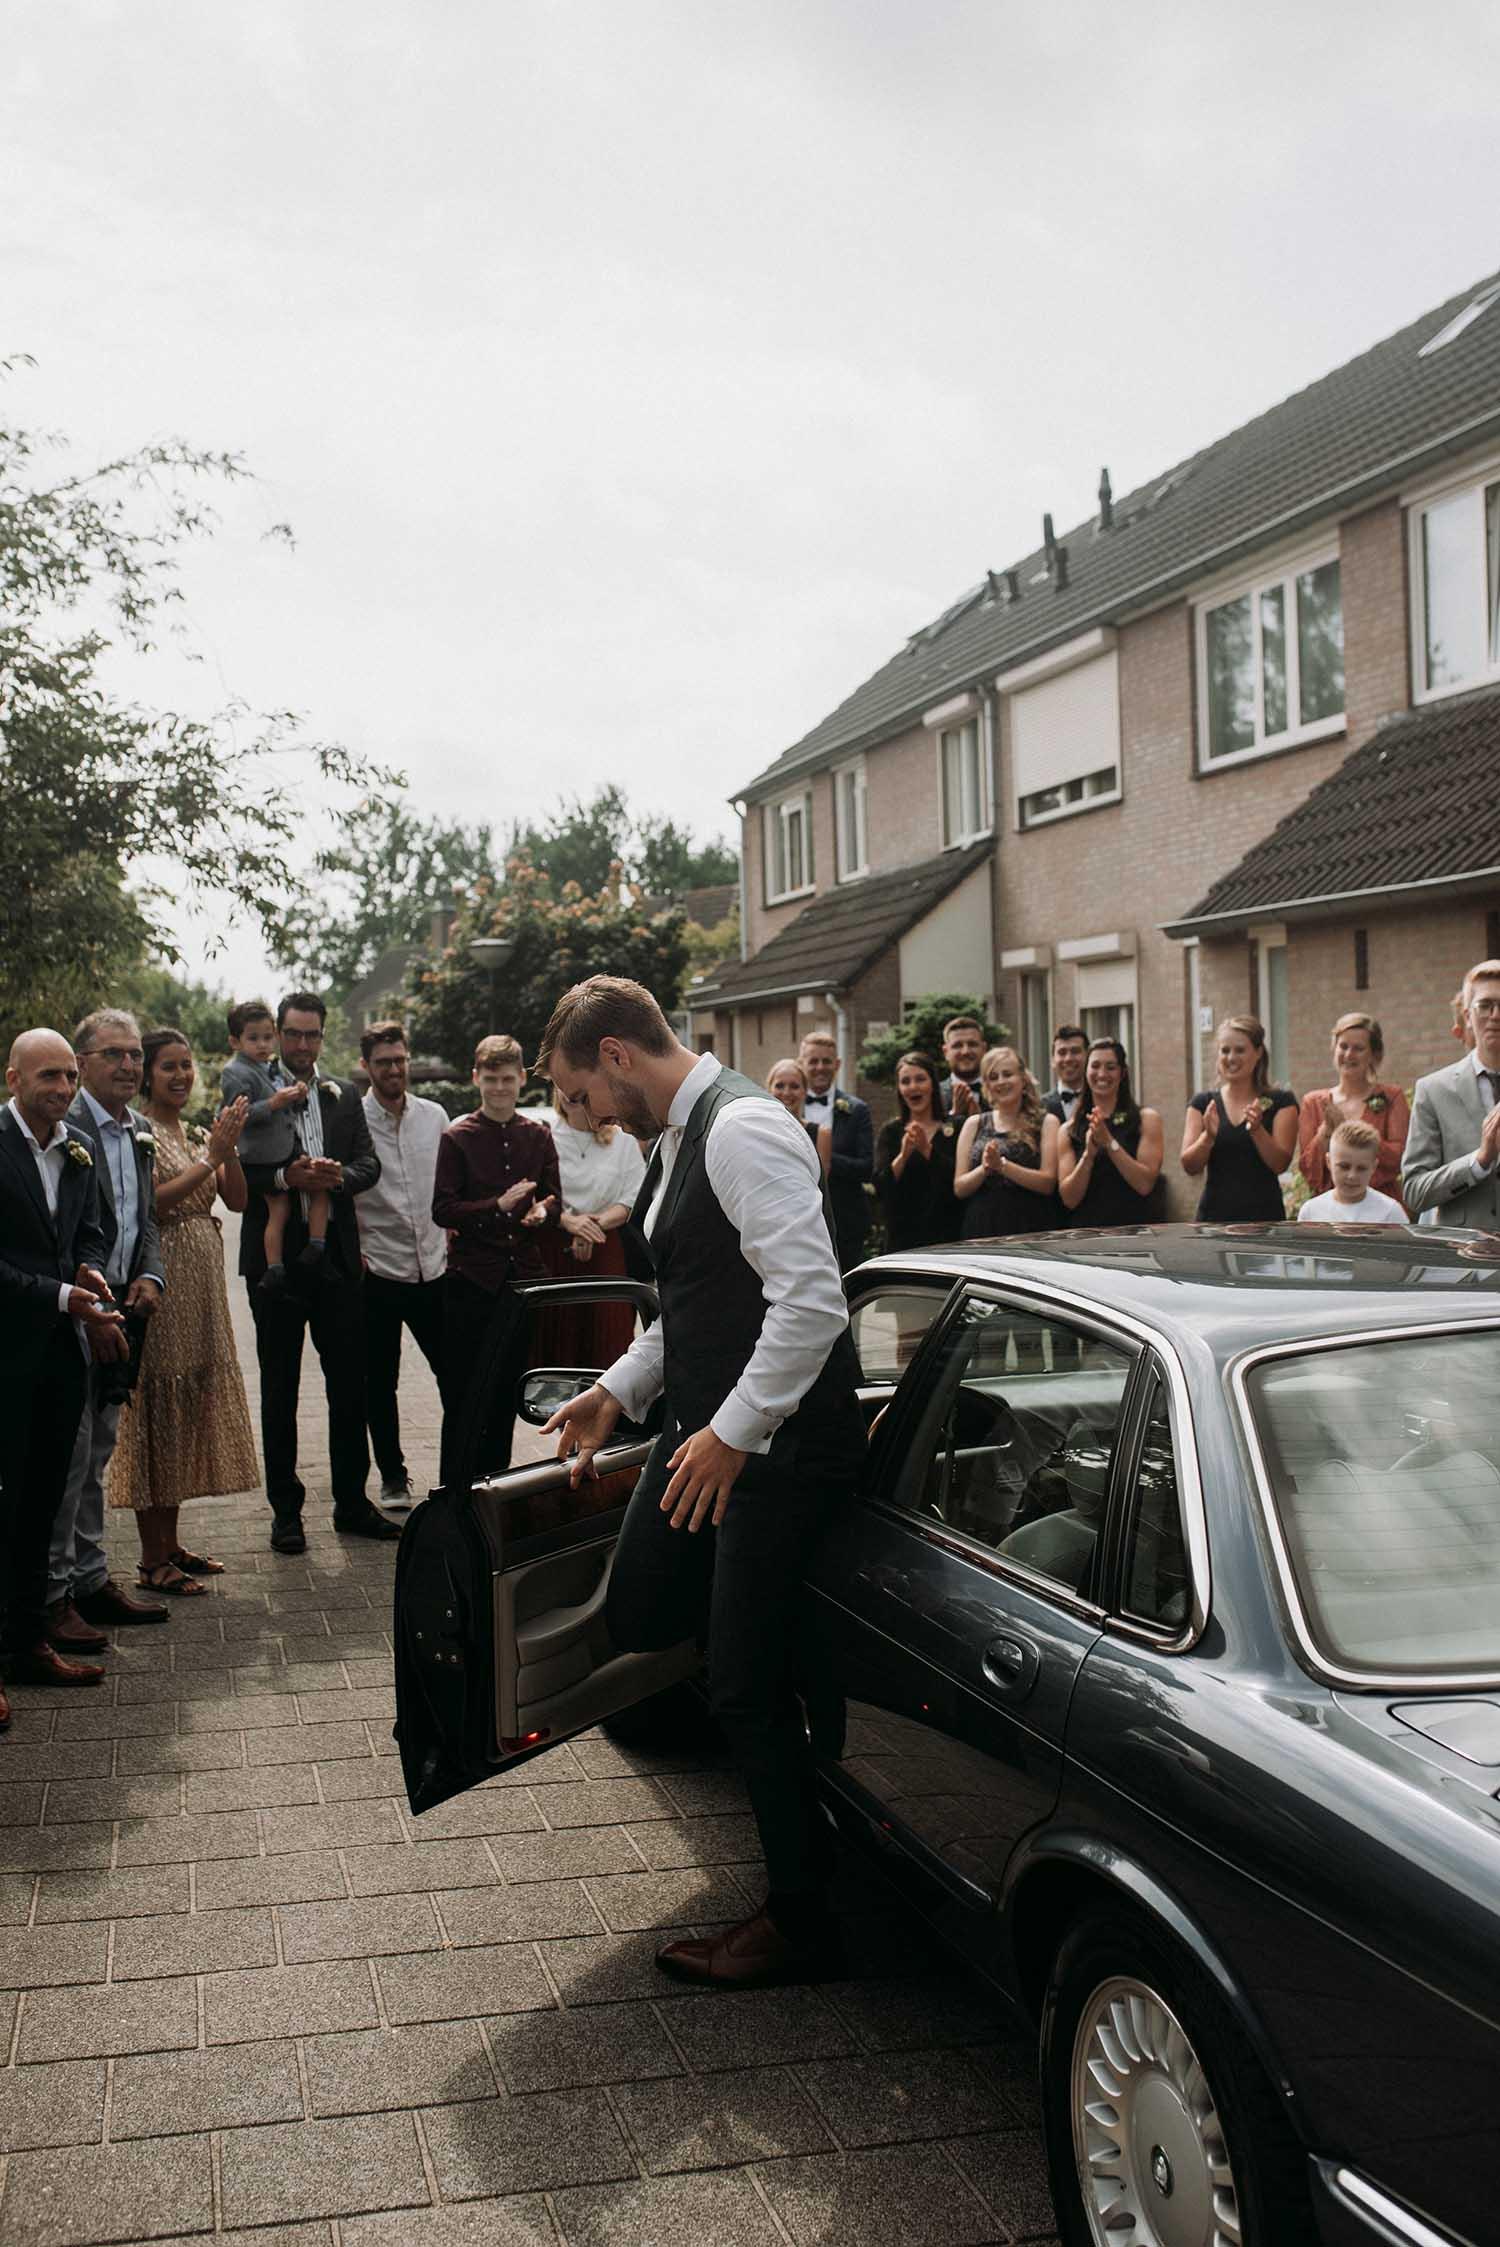 _trouwfotograaf_nederland_limburg_bruiloft_boho_vintage_wedding_foodtruck_taart_bruid_bruidegom_bruidsfotograaf_Brabant_Roermond_KasteeltjeHattum_zomerbruiloft_summerwedding_trouwjurk_buitenceremonie_BureauCocoon